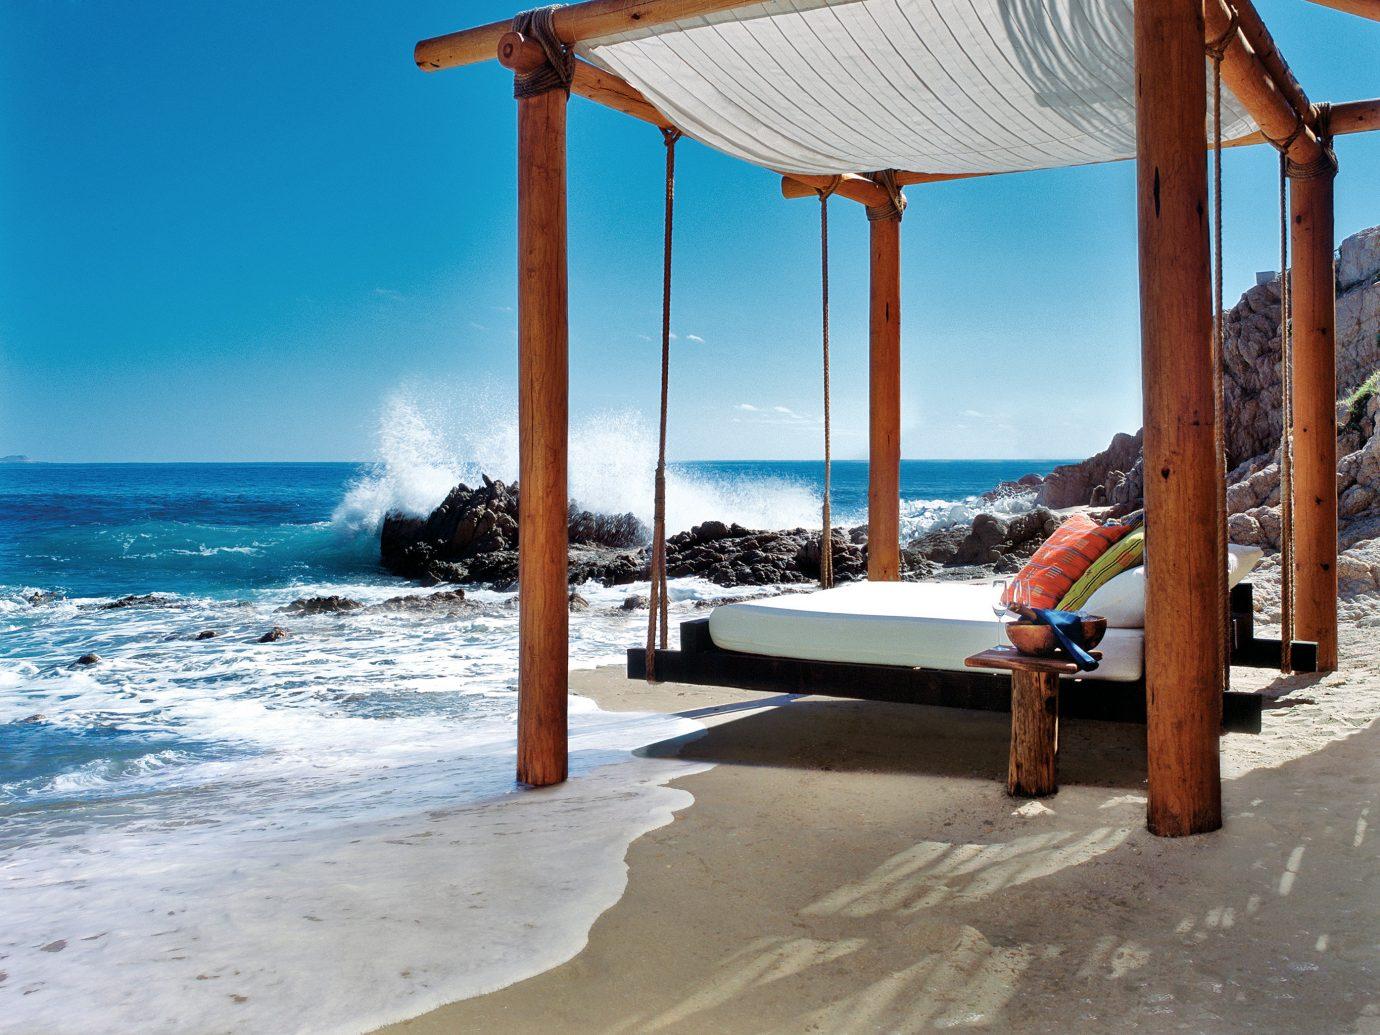 Beach Beachfront Celebs Hotels Play Resort Romance Romantic Trip Ideas sky outdoor leisure vacation Ocean Sea caribbean walkway swimming pool estate shore sandy several